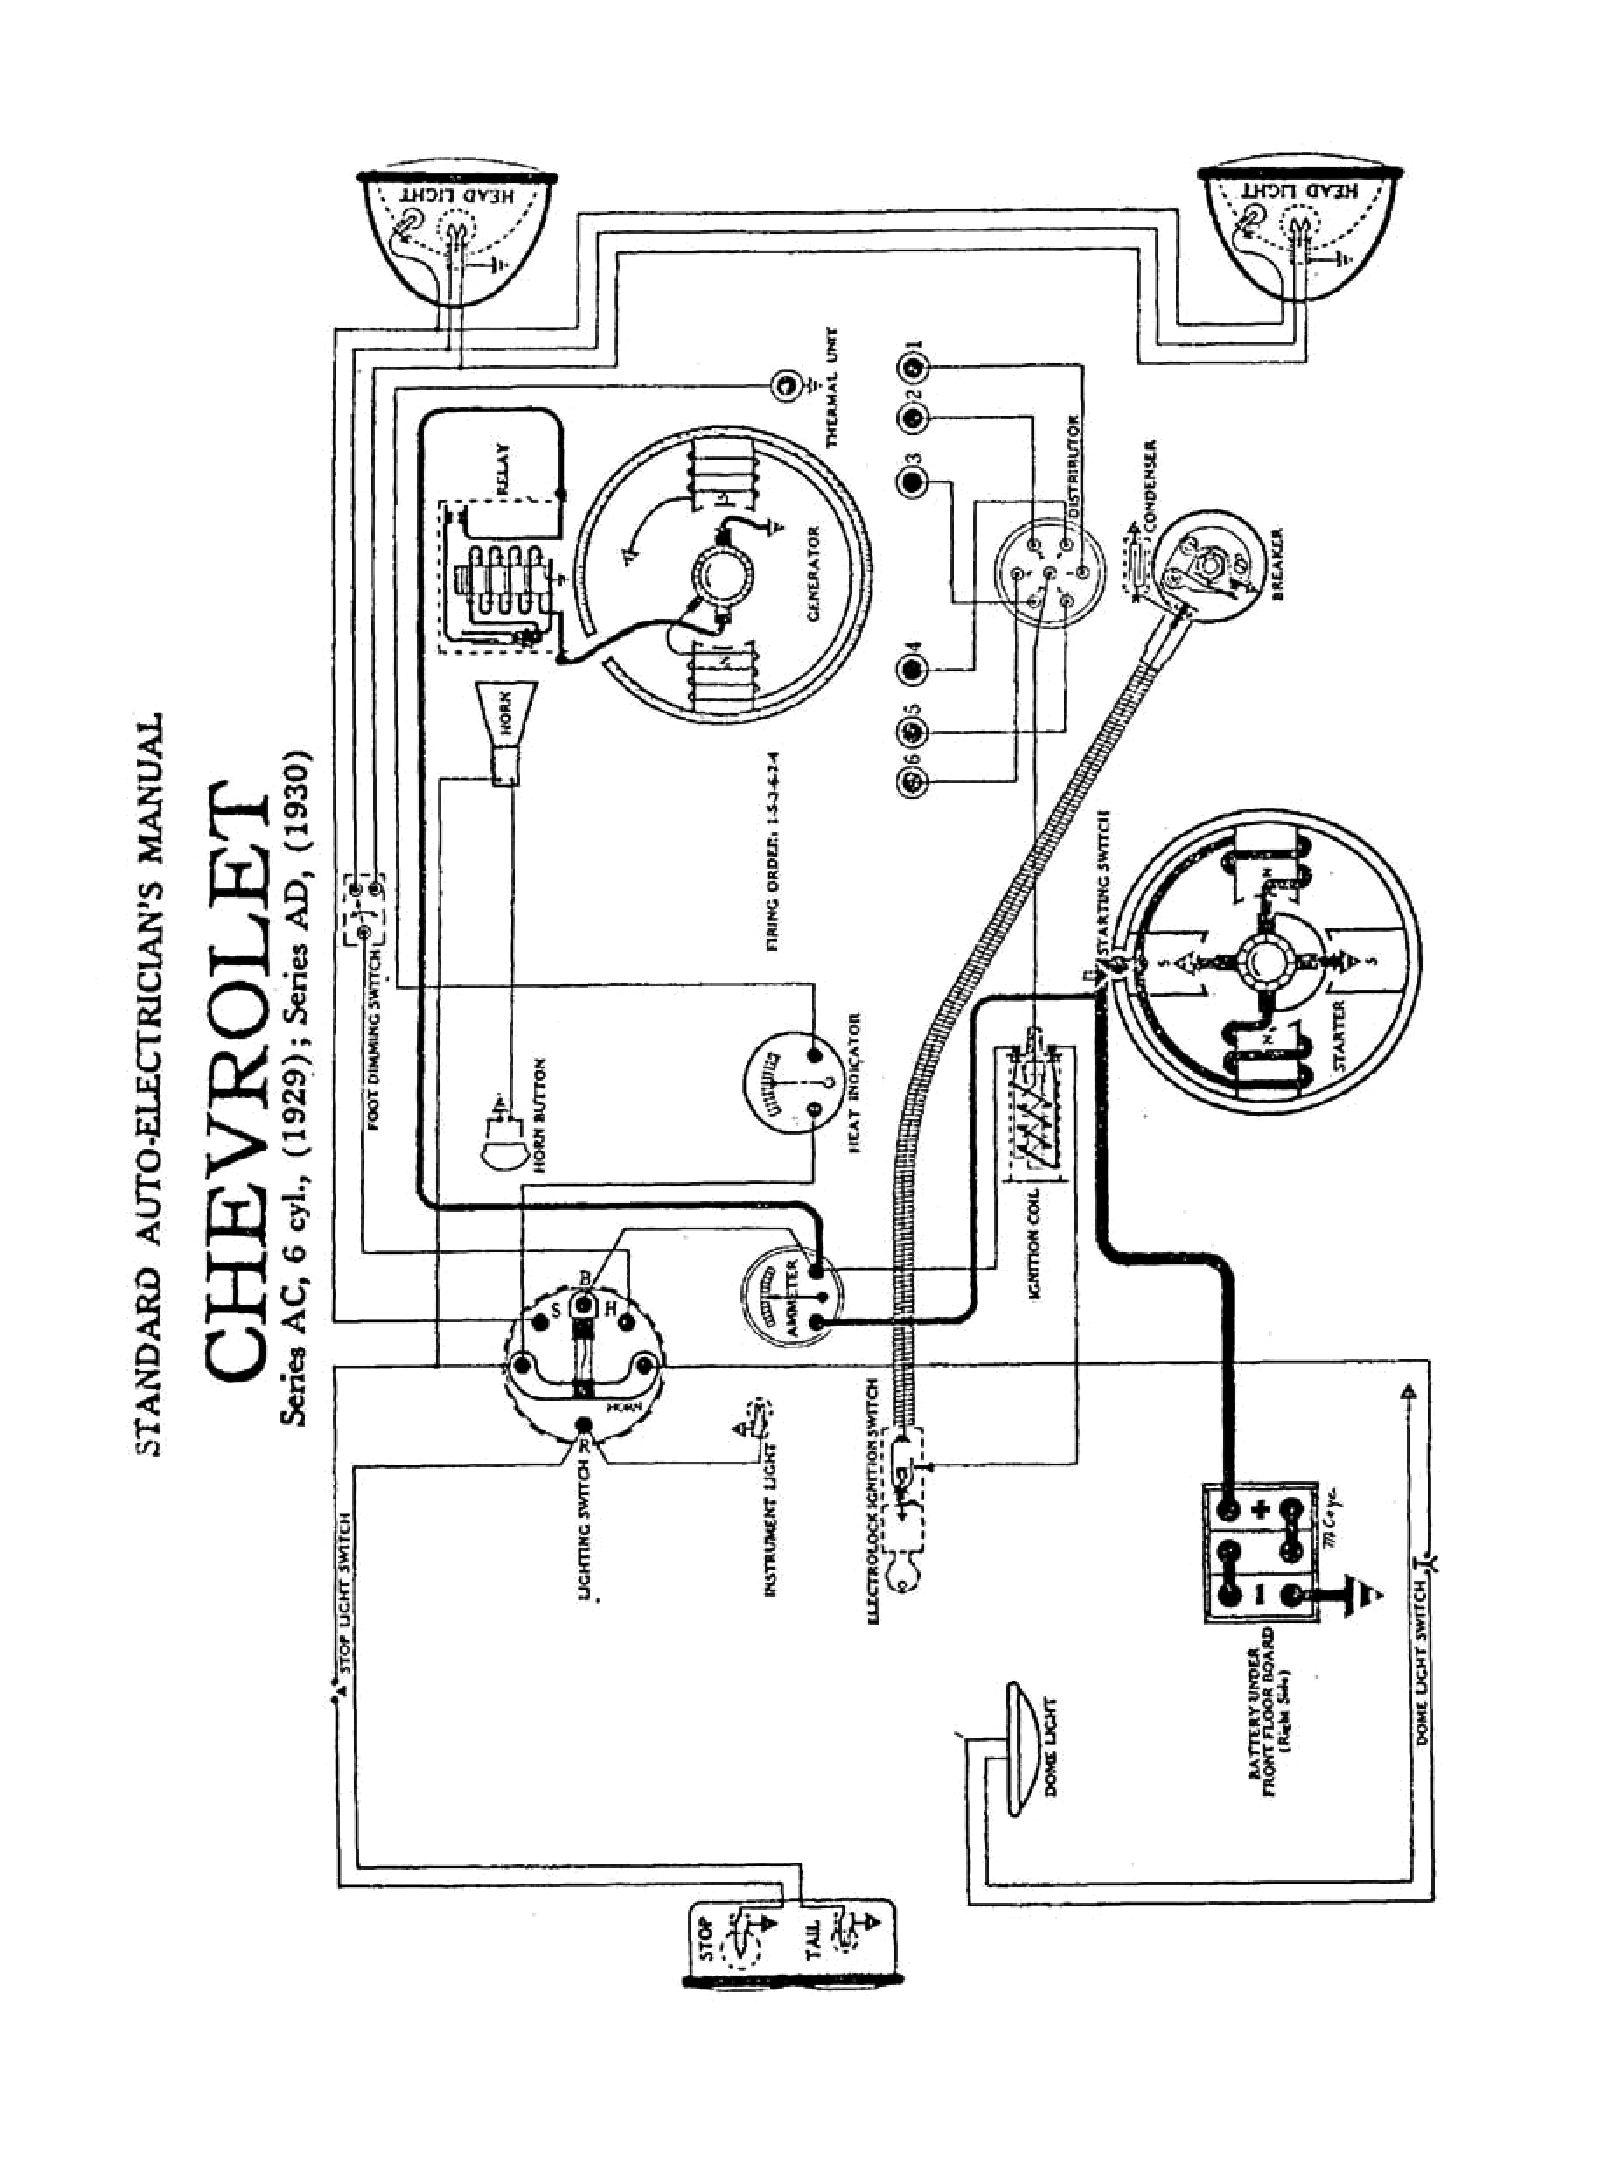 1929 ford wiring diagram wiring diagram all data